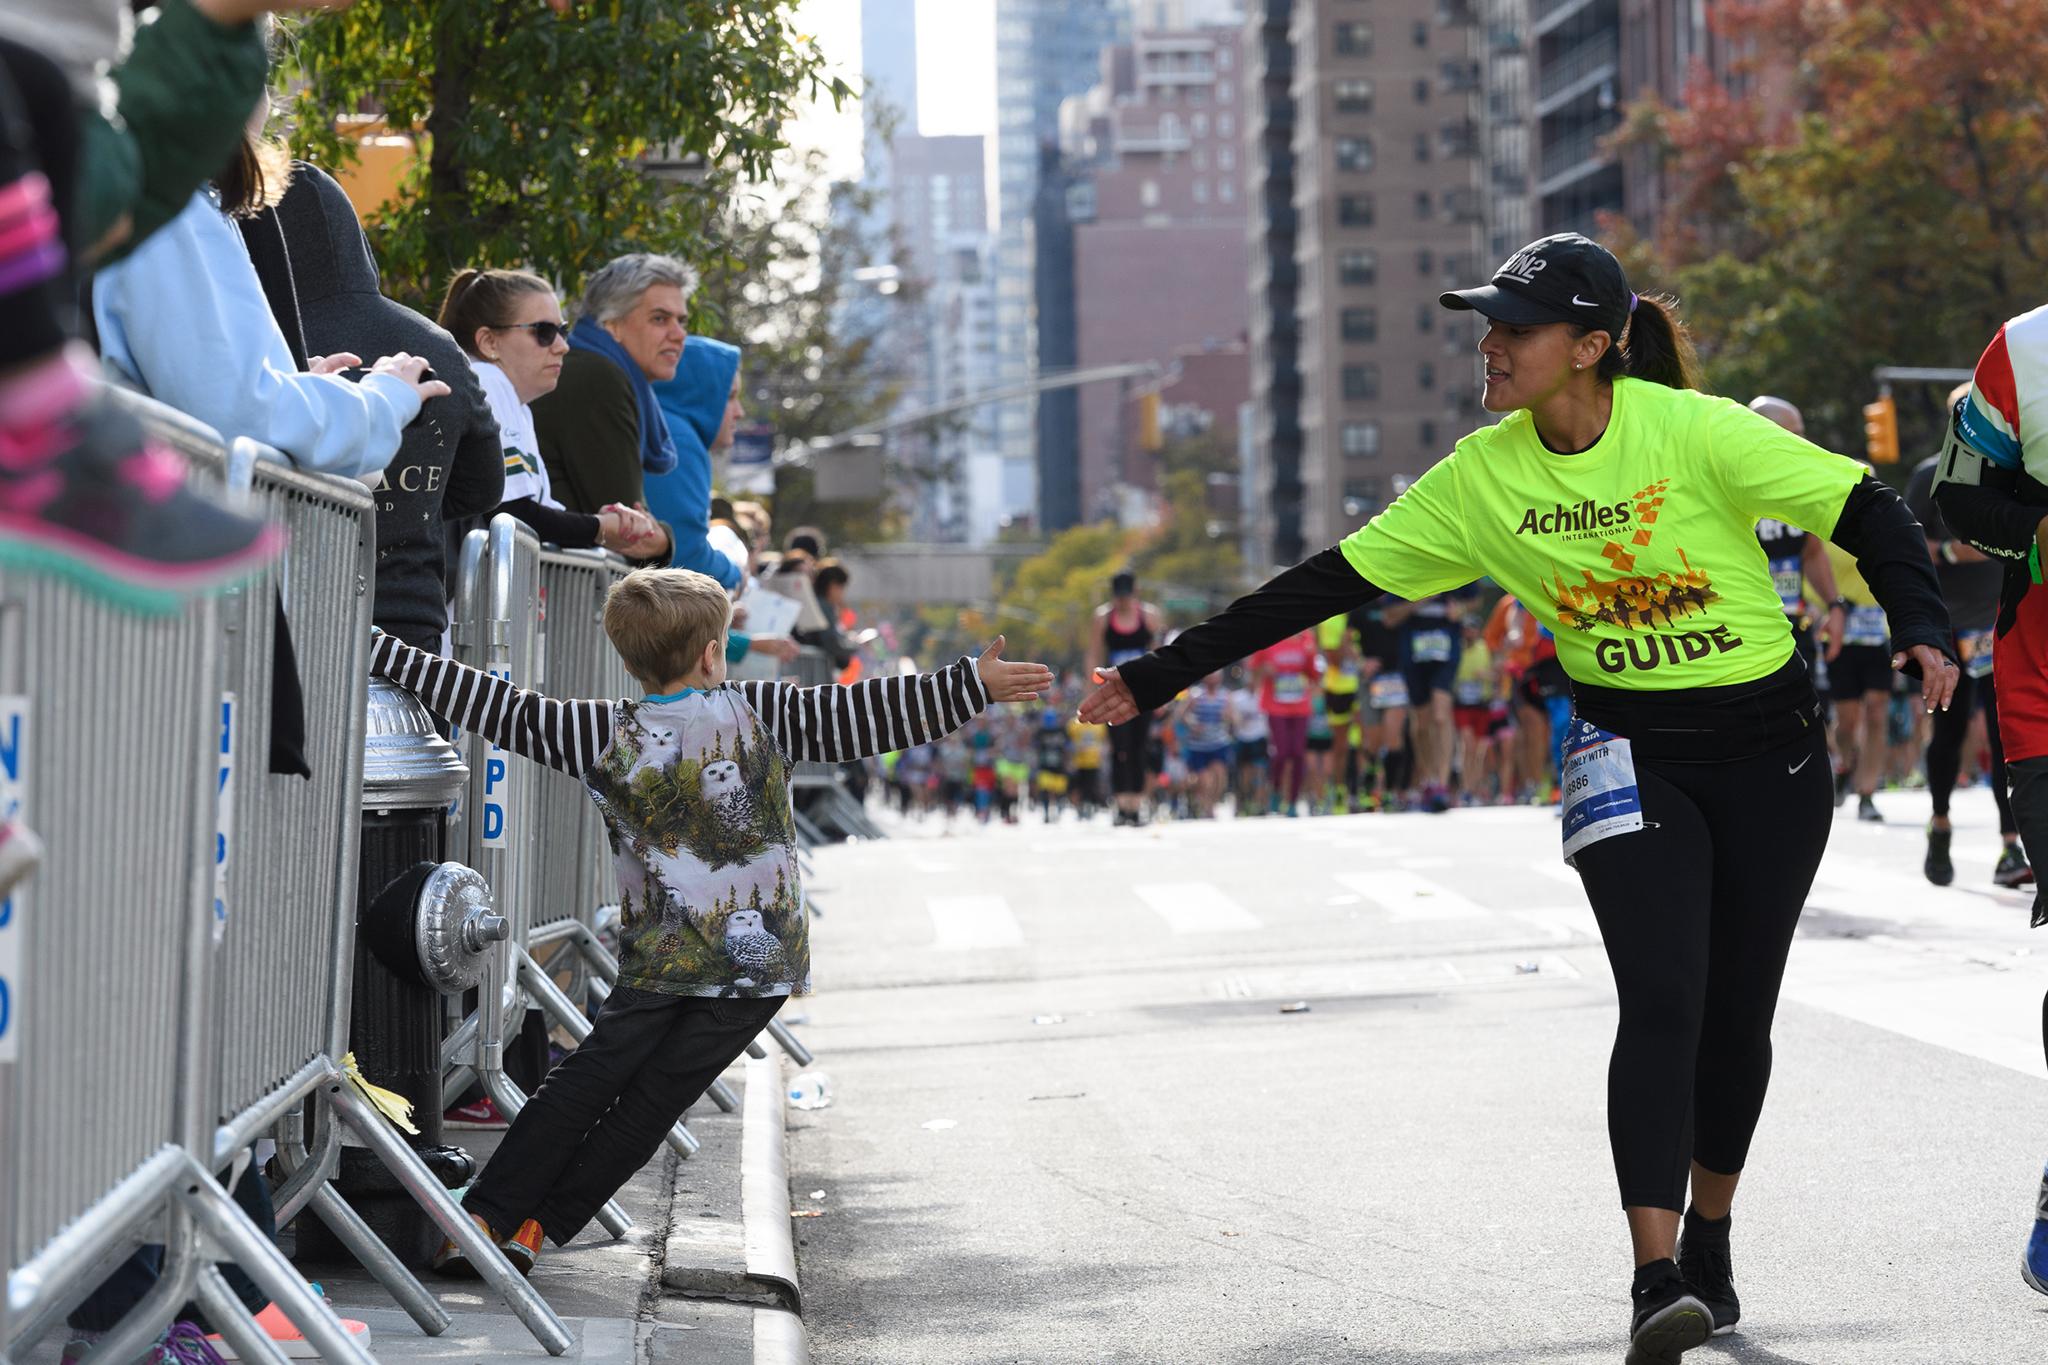 NYC Marathon 2016 photos